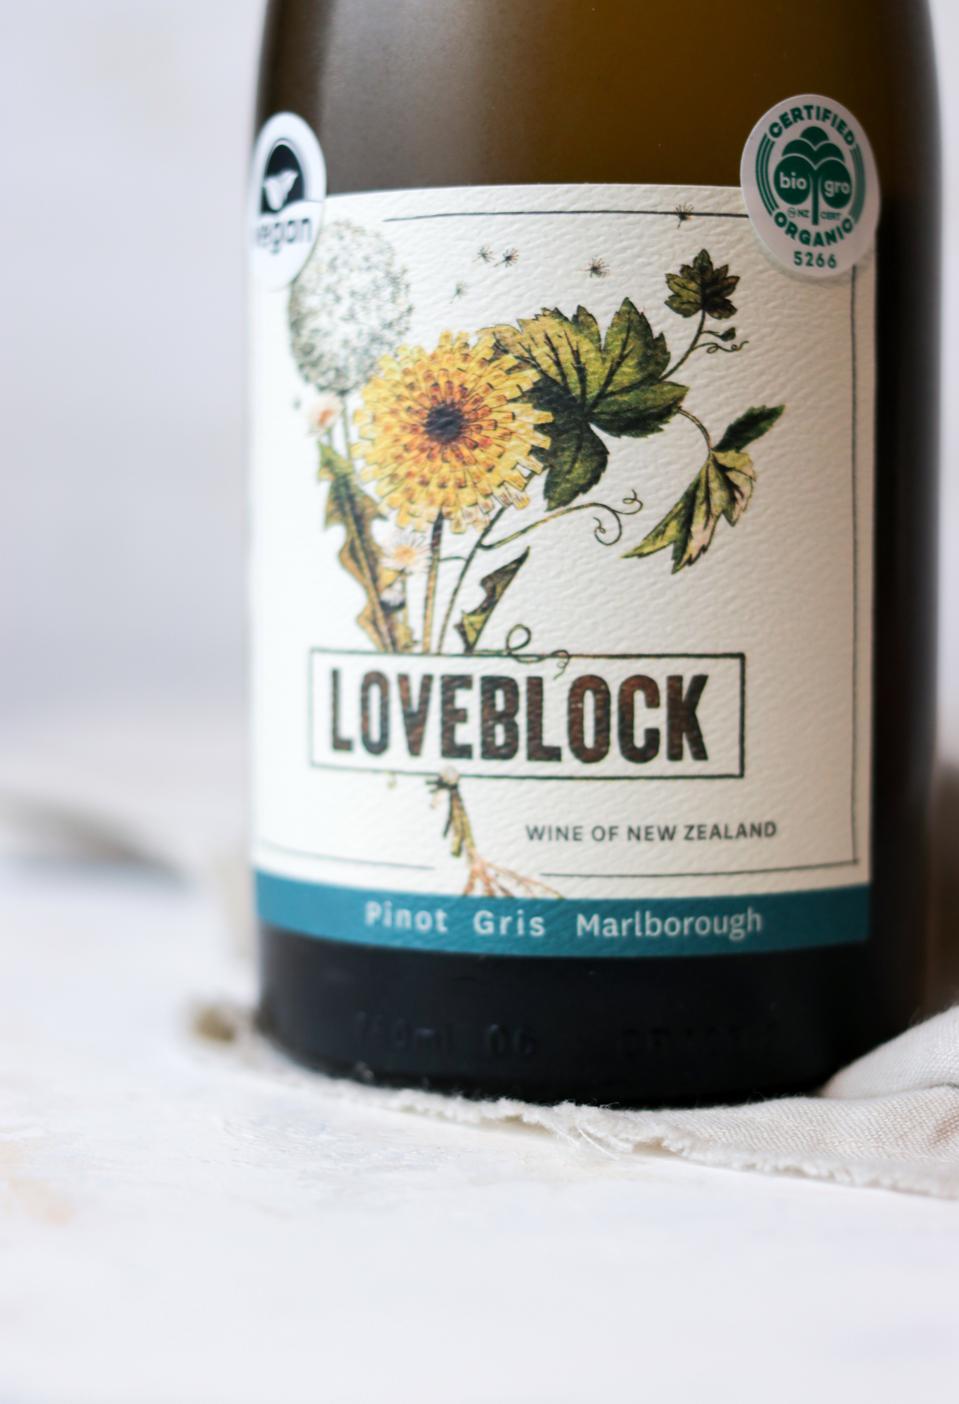 Bottle of Loveblock New Zealand Pinot Gris